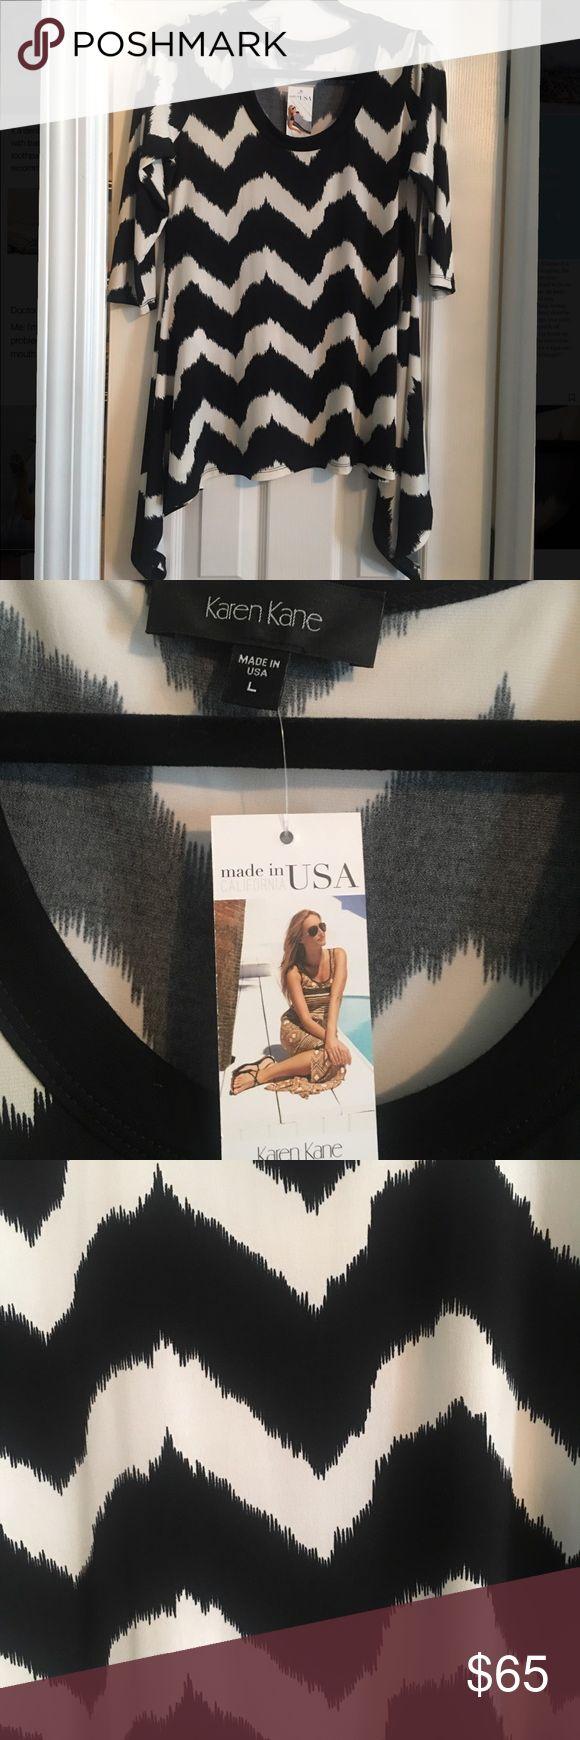 Karen Kane black and white chevron shirt Karen Kane black and white chevron shirt. BNWT. Made in the USA. Karen Kane Tops Tunics